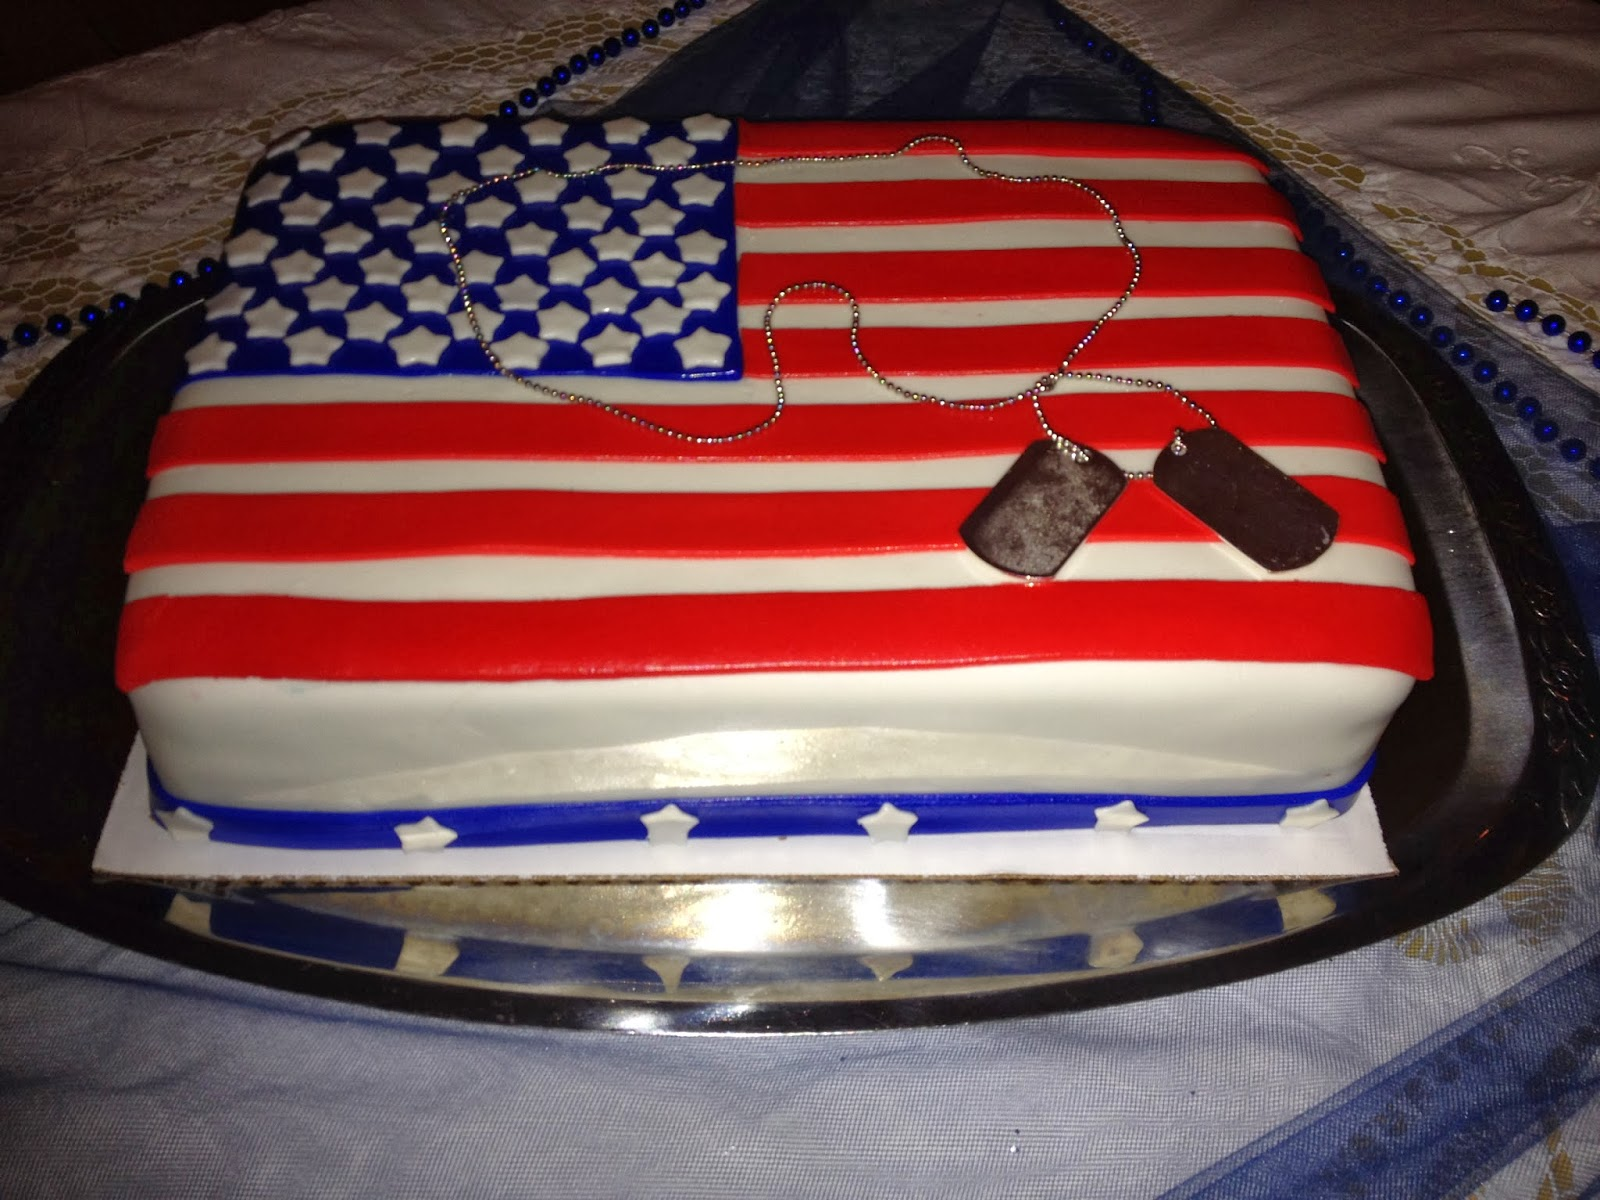 amerikansk flag kage